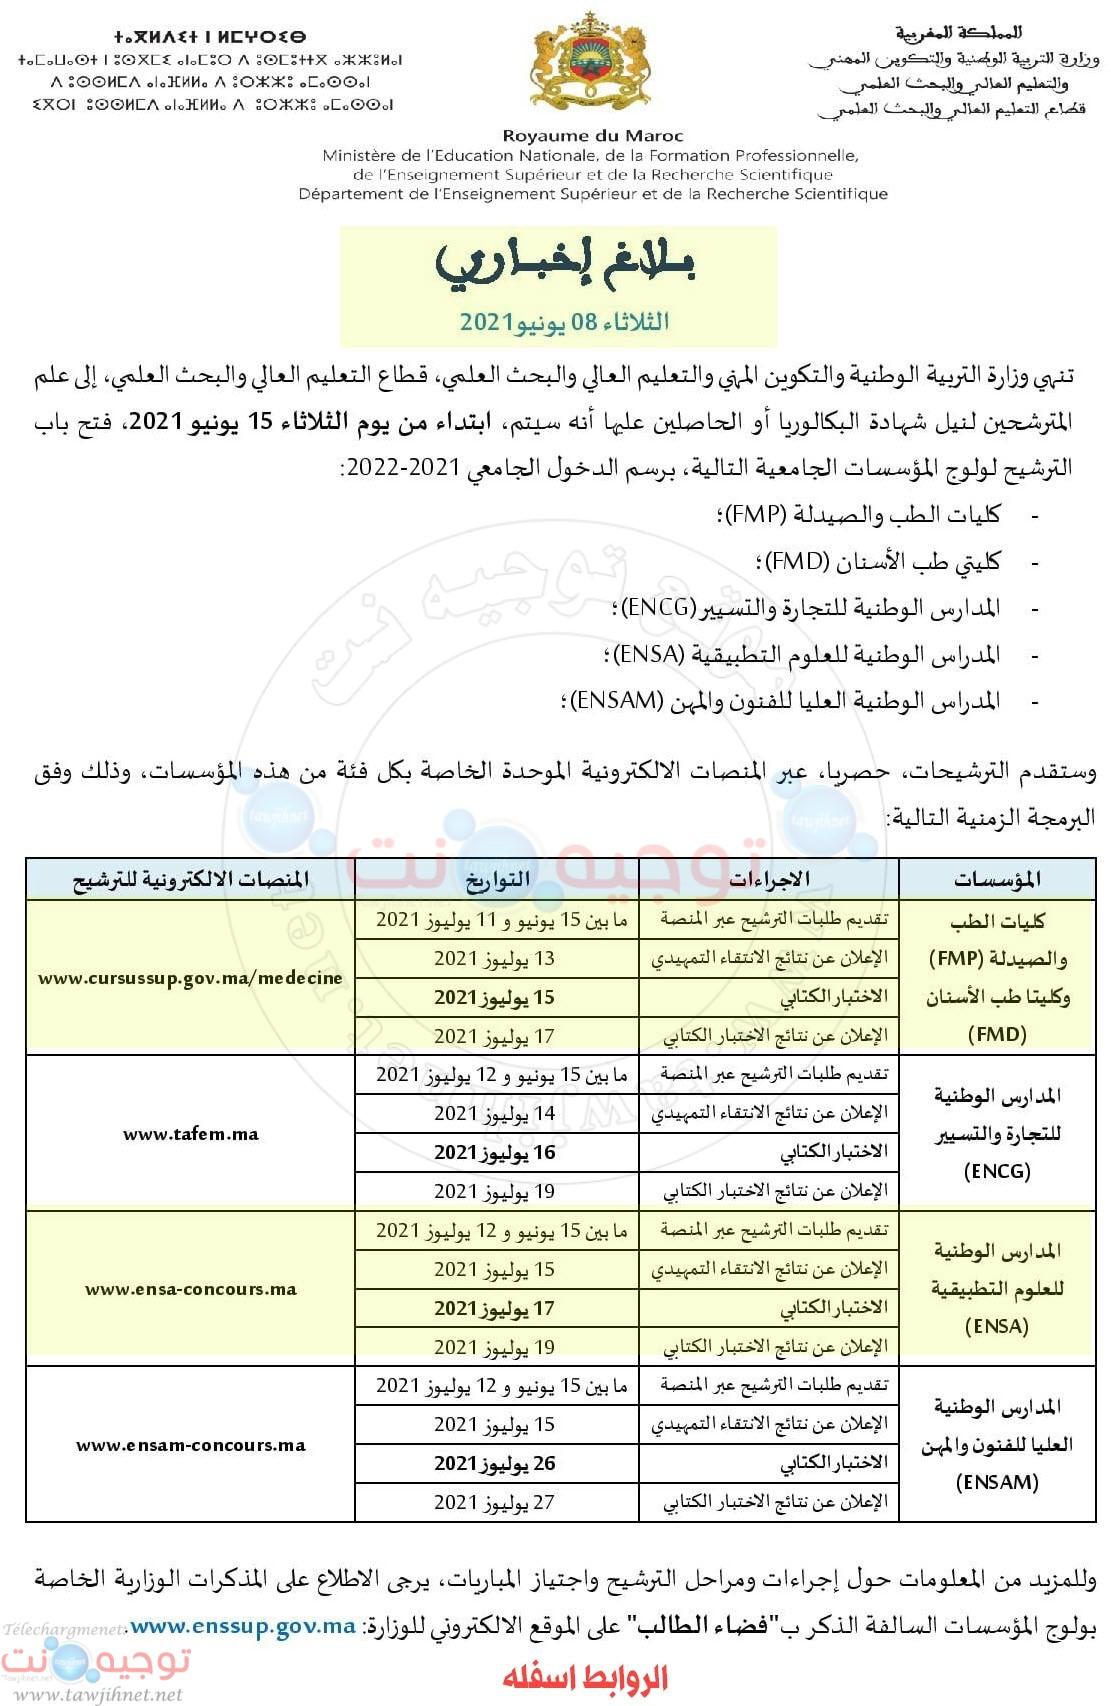 Notes-ENCG-ENSAM-Medecine-ENSAM-2021.jpg